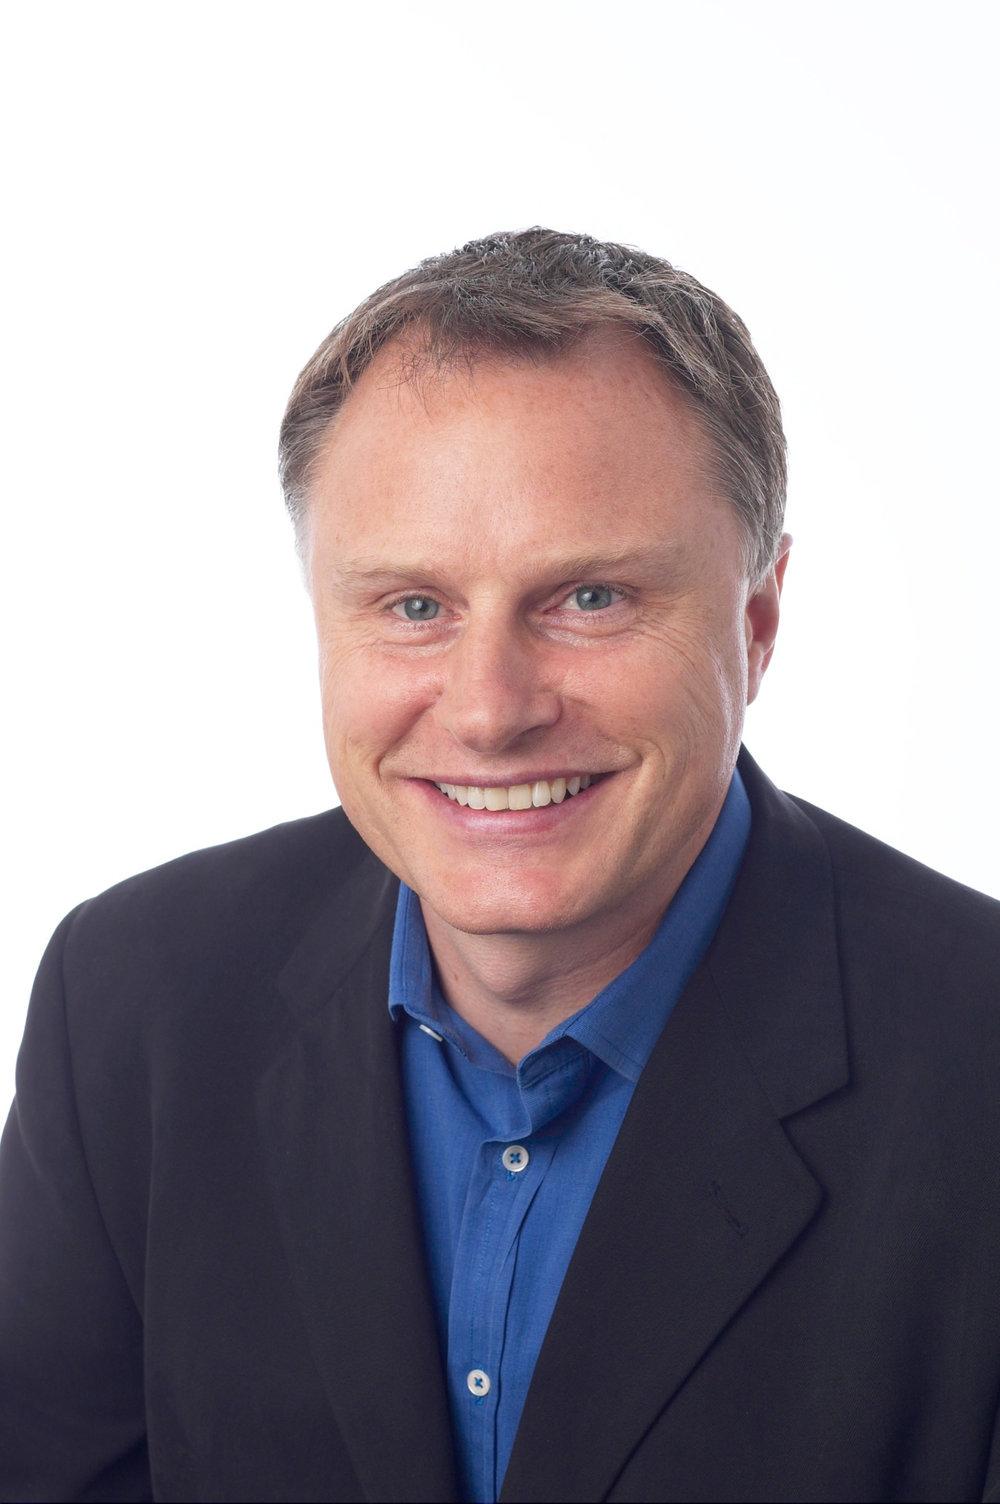 John Hartnett, CEO, SVG Partners/THRIVE